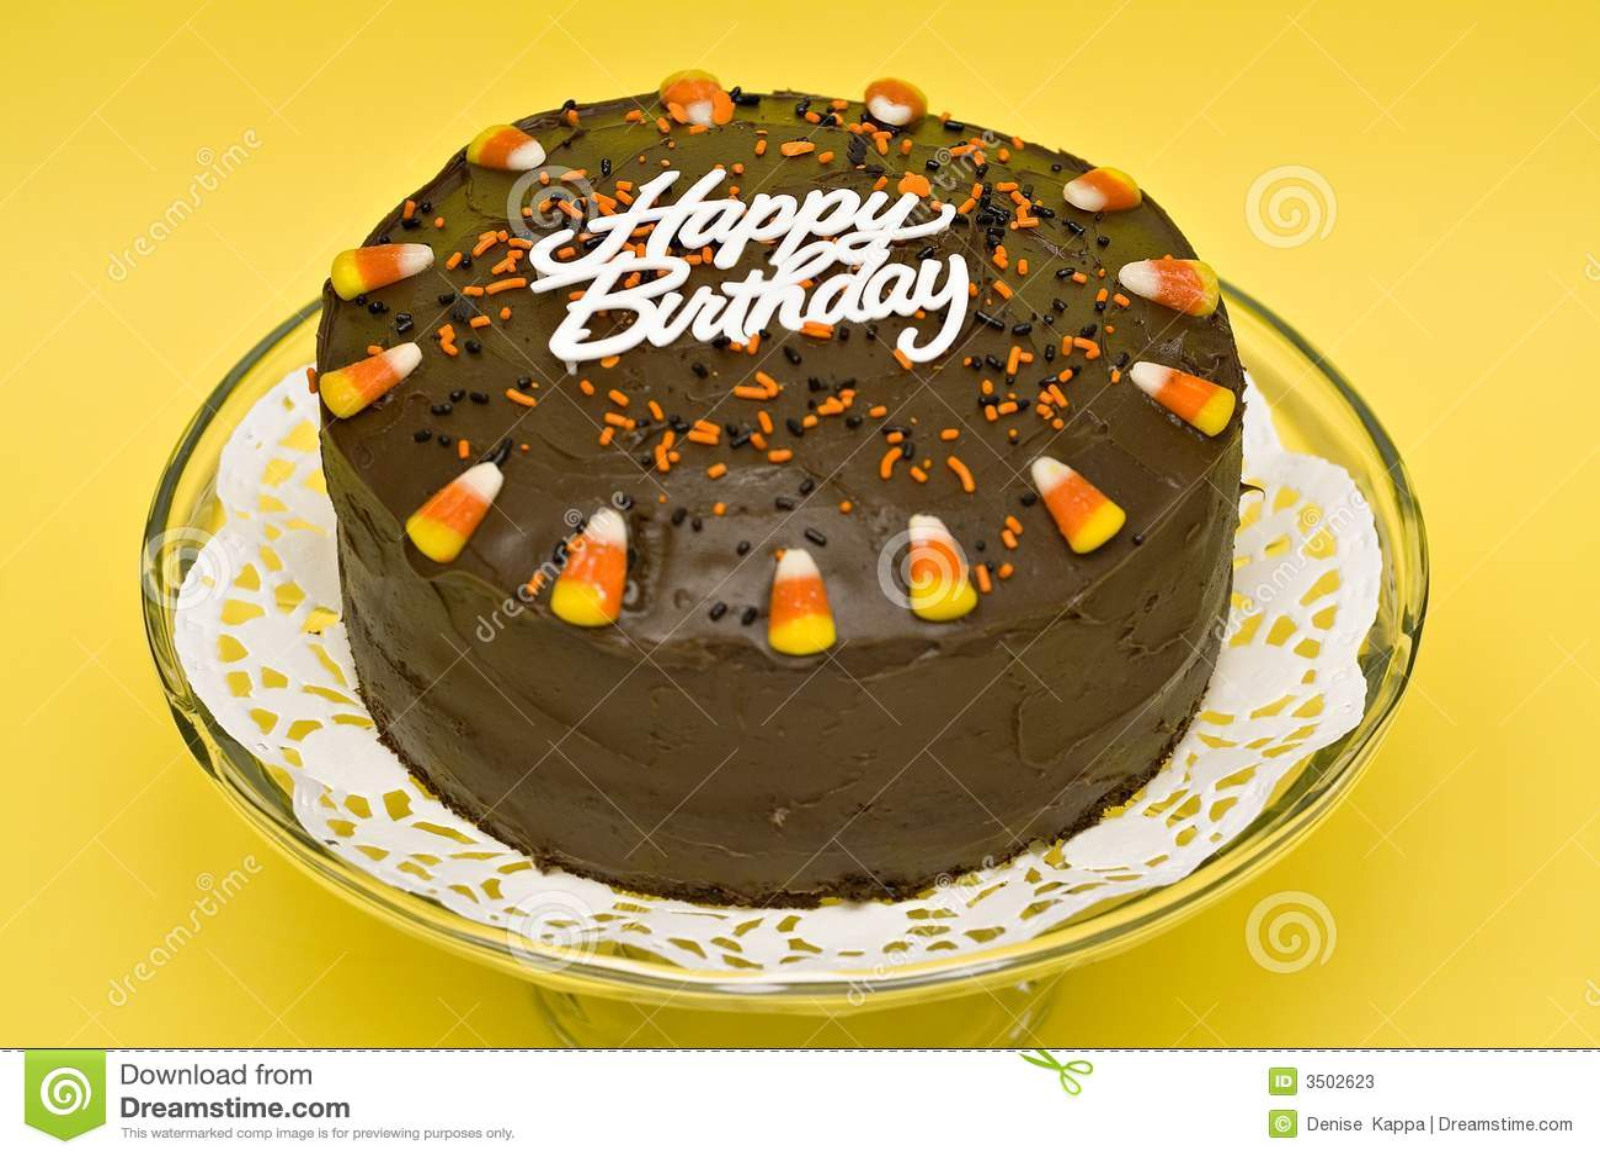 Birthday Cake Stock Image Image Of Yellow Sweets Food 3502623